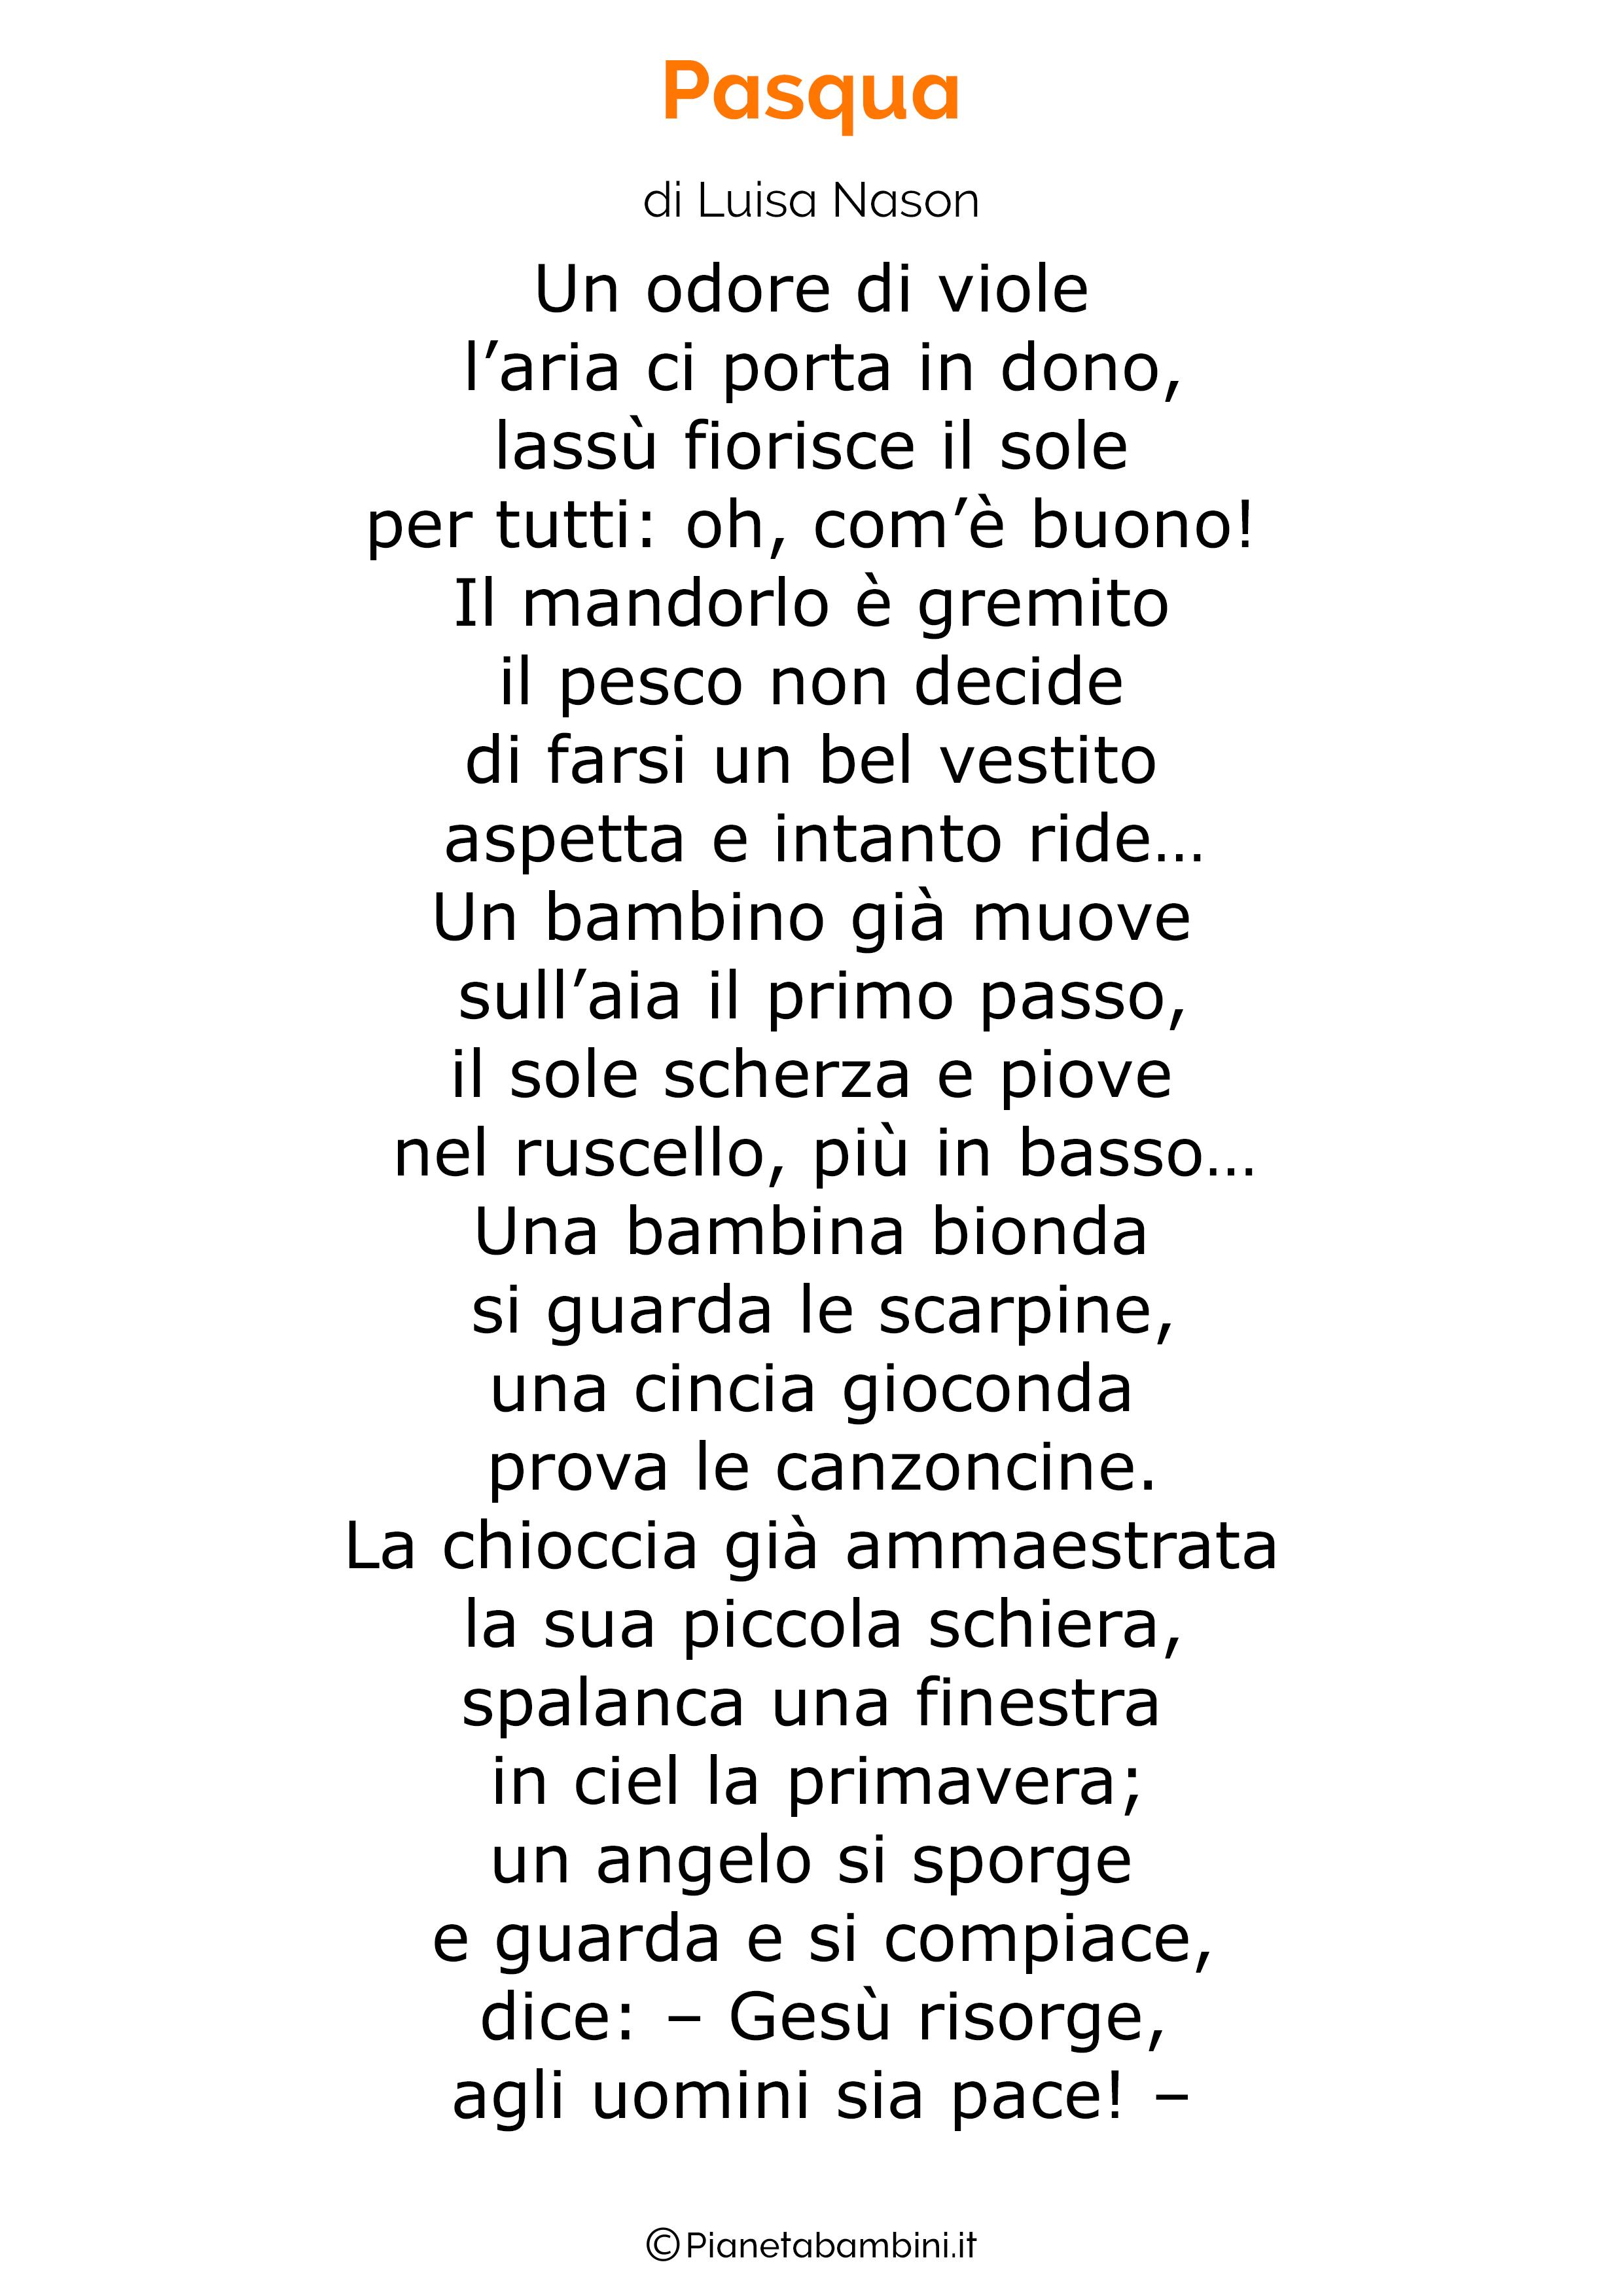 Poesia di Pasqua 07